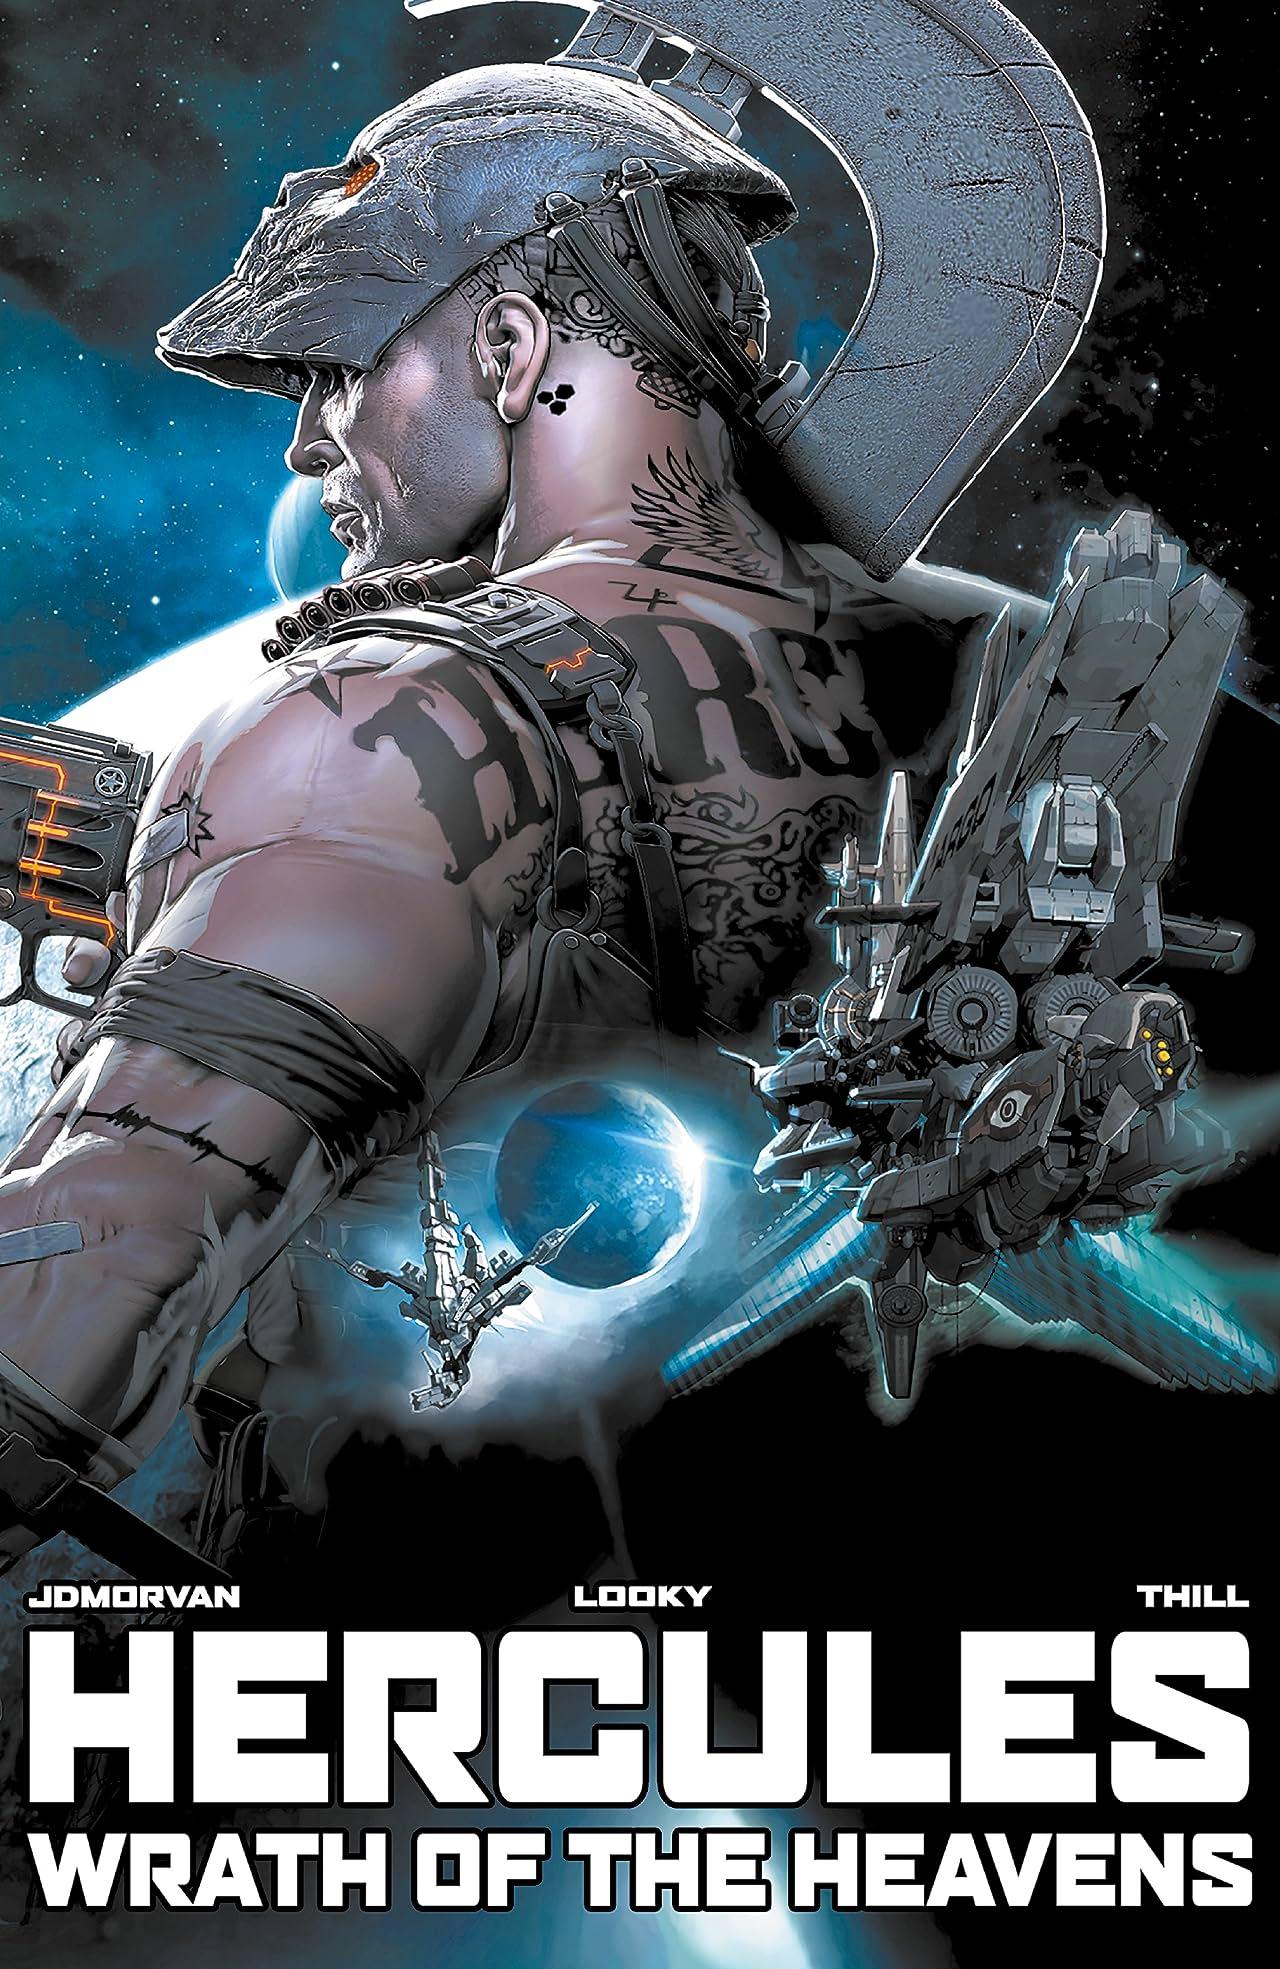 Hercules: Wrath of the Heavens Vol. 1